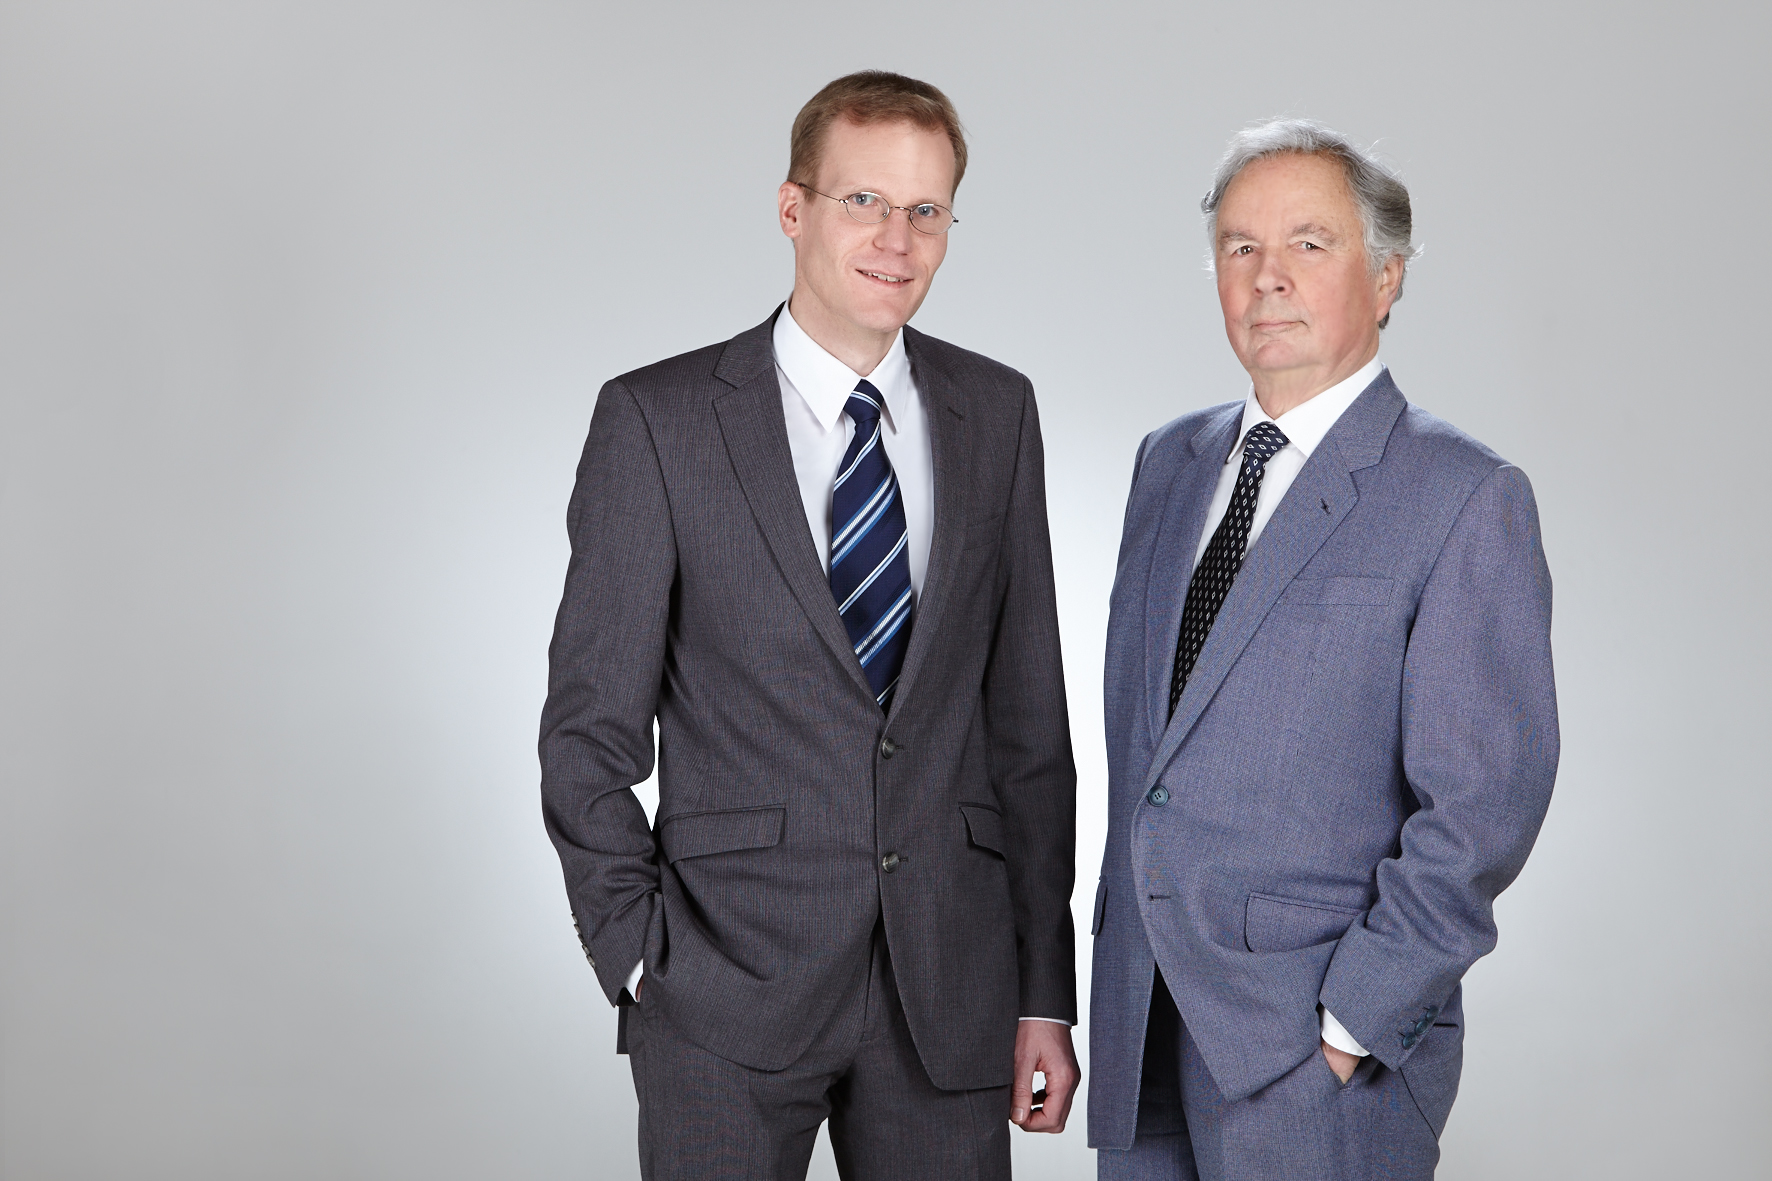 Dr.-Ing. Albert J. Wimmer and Dipl.-Ing. Rudolf Stegherr of Isar Getriebetechnik